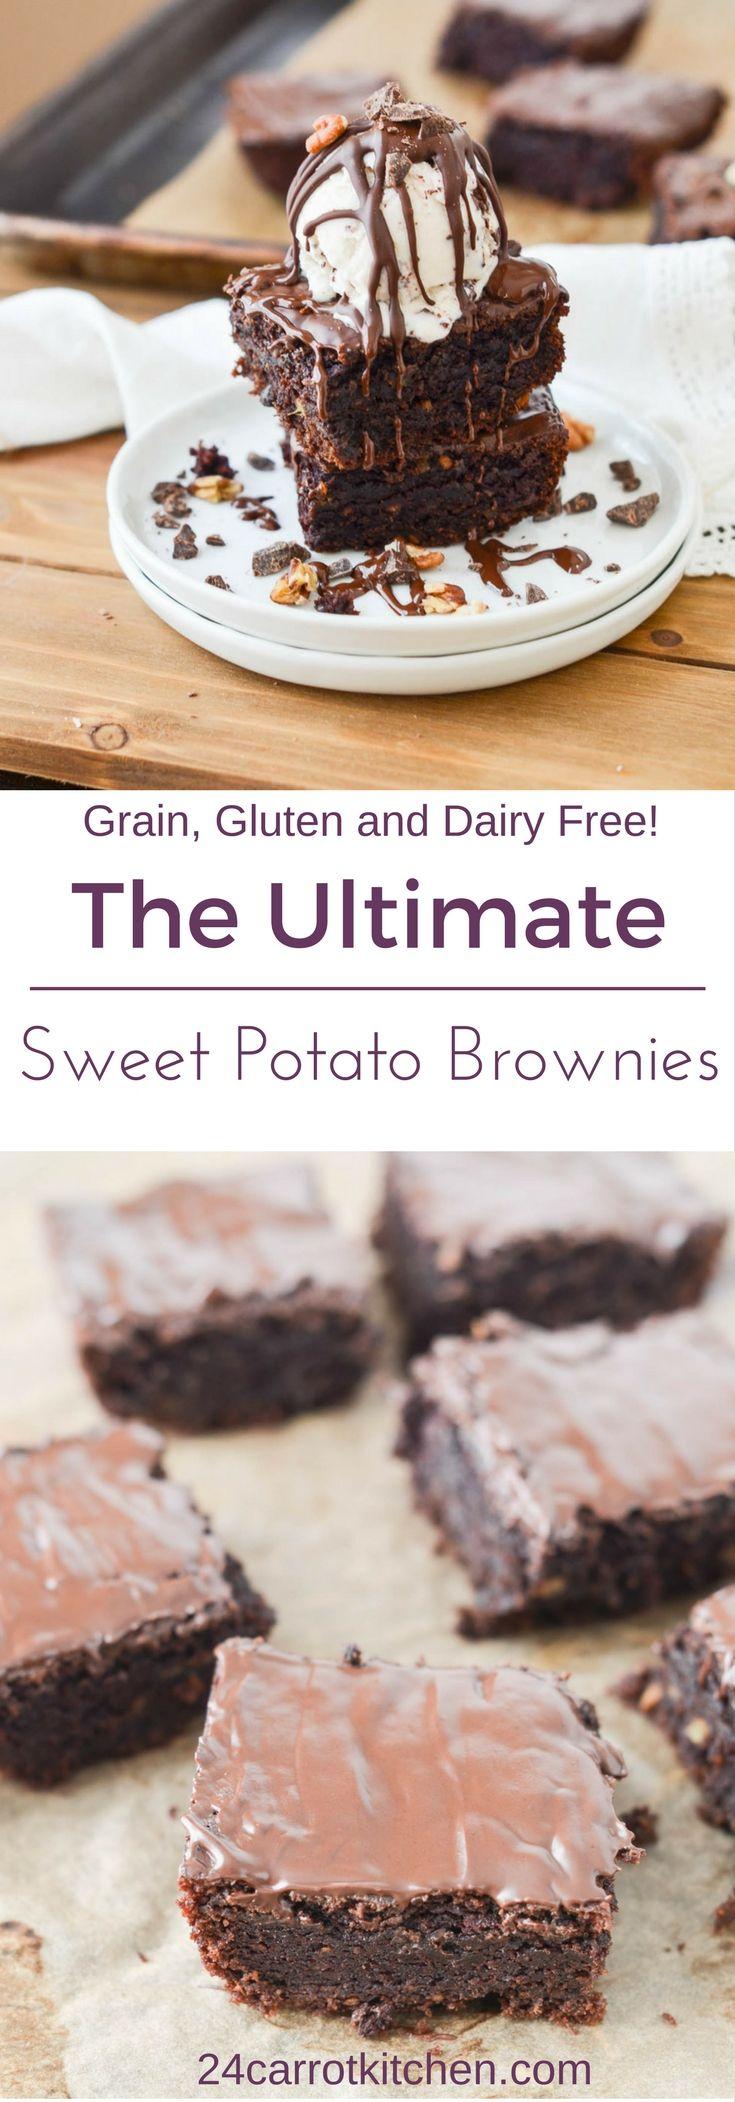 Sweet Potato Brownies - #Paleo #grainfree #glutenfree #dairyfree #vegan